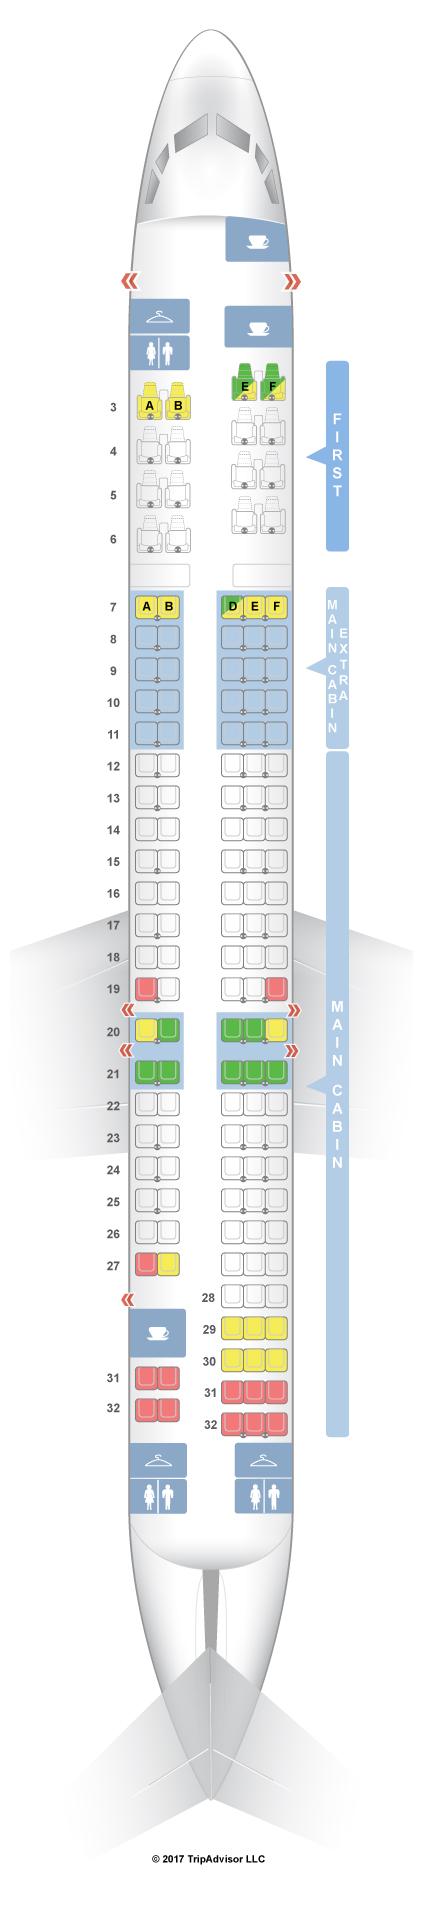 seatguru seat map american airlines mcdonnell douglas md 80 m80